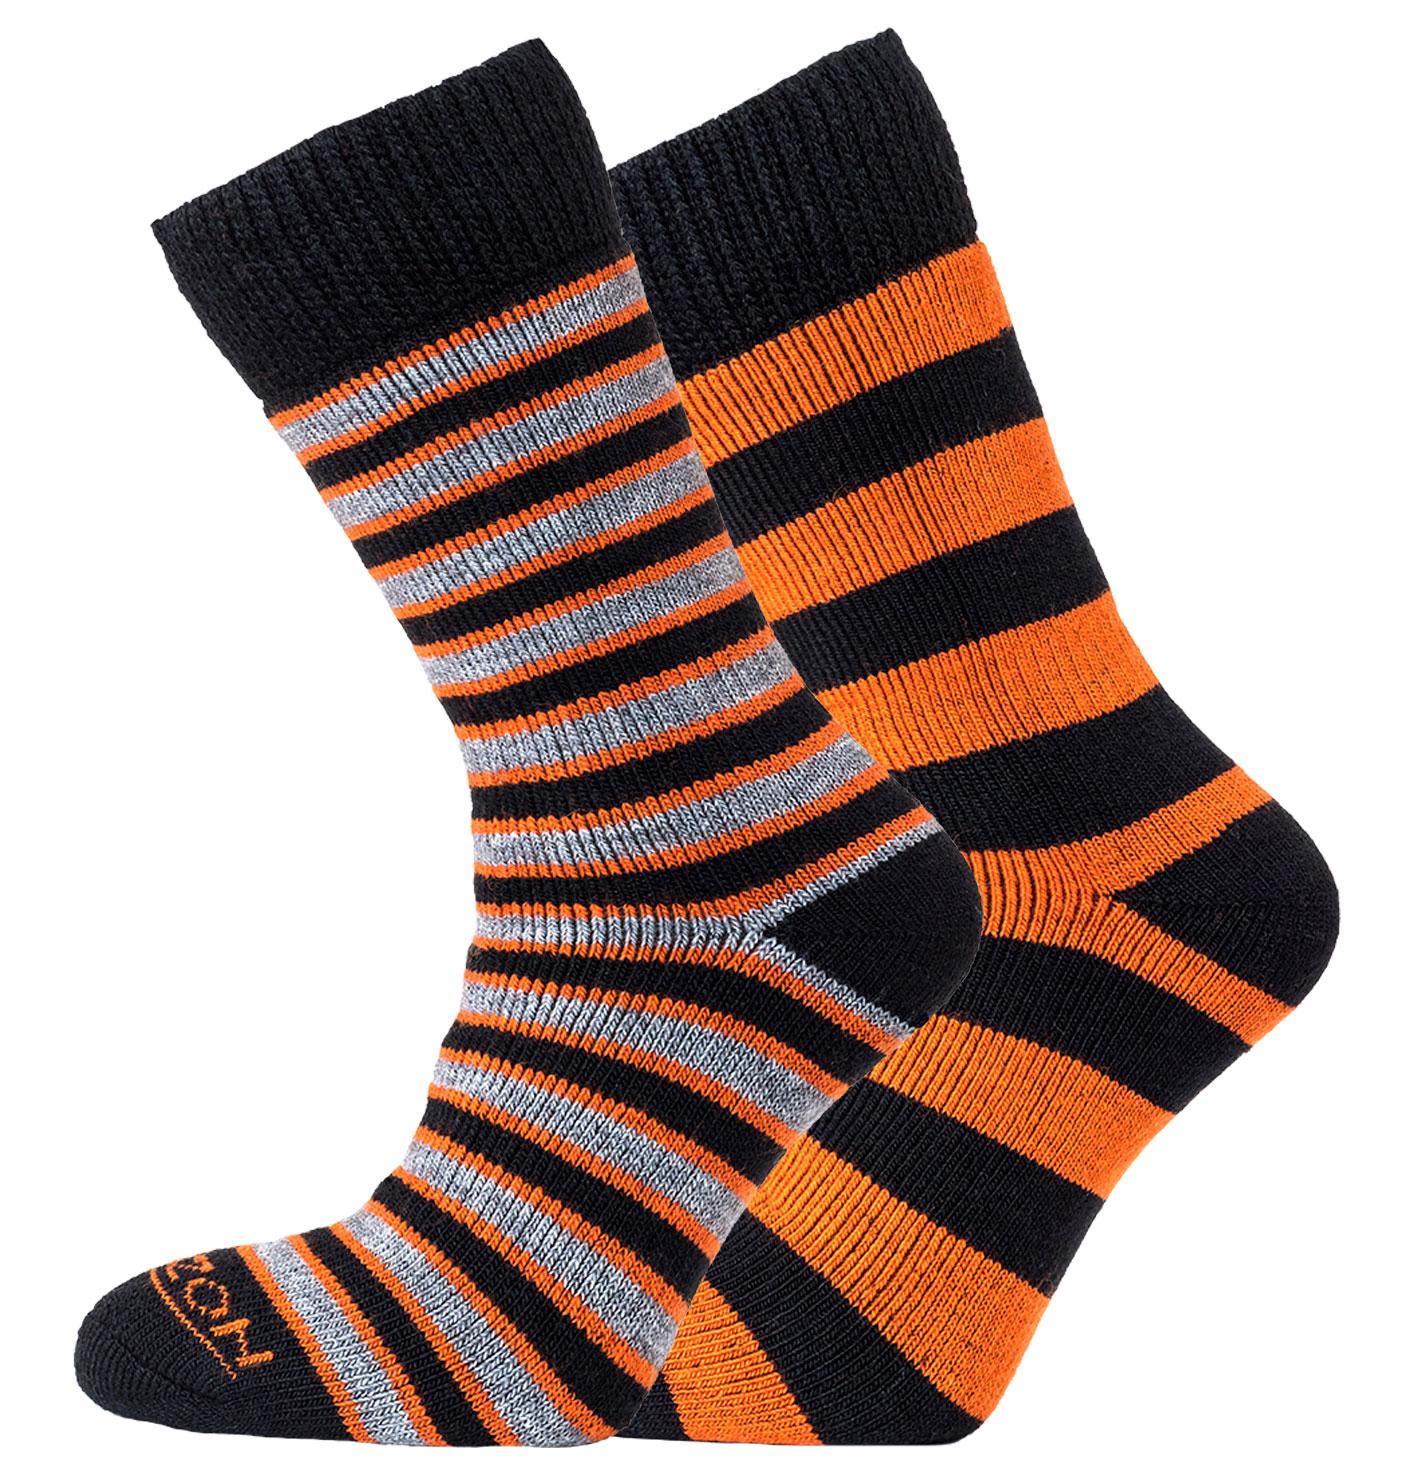 Merino Outdoor 2pk – Stripes & Hoops Orange/Black